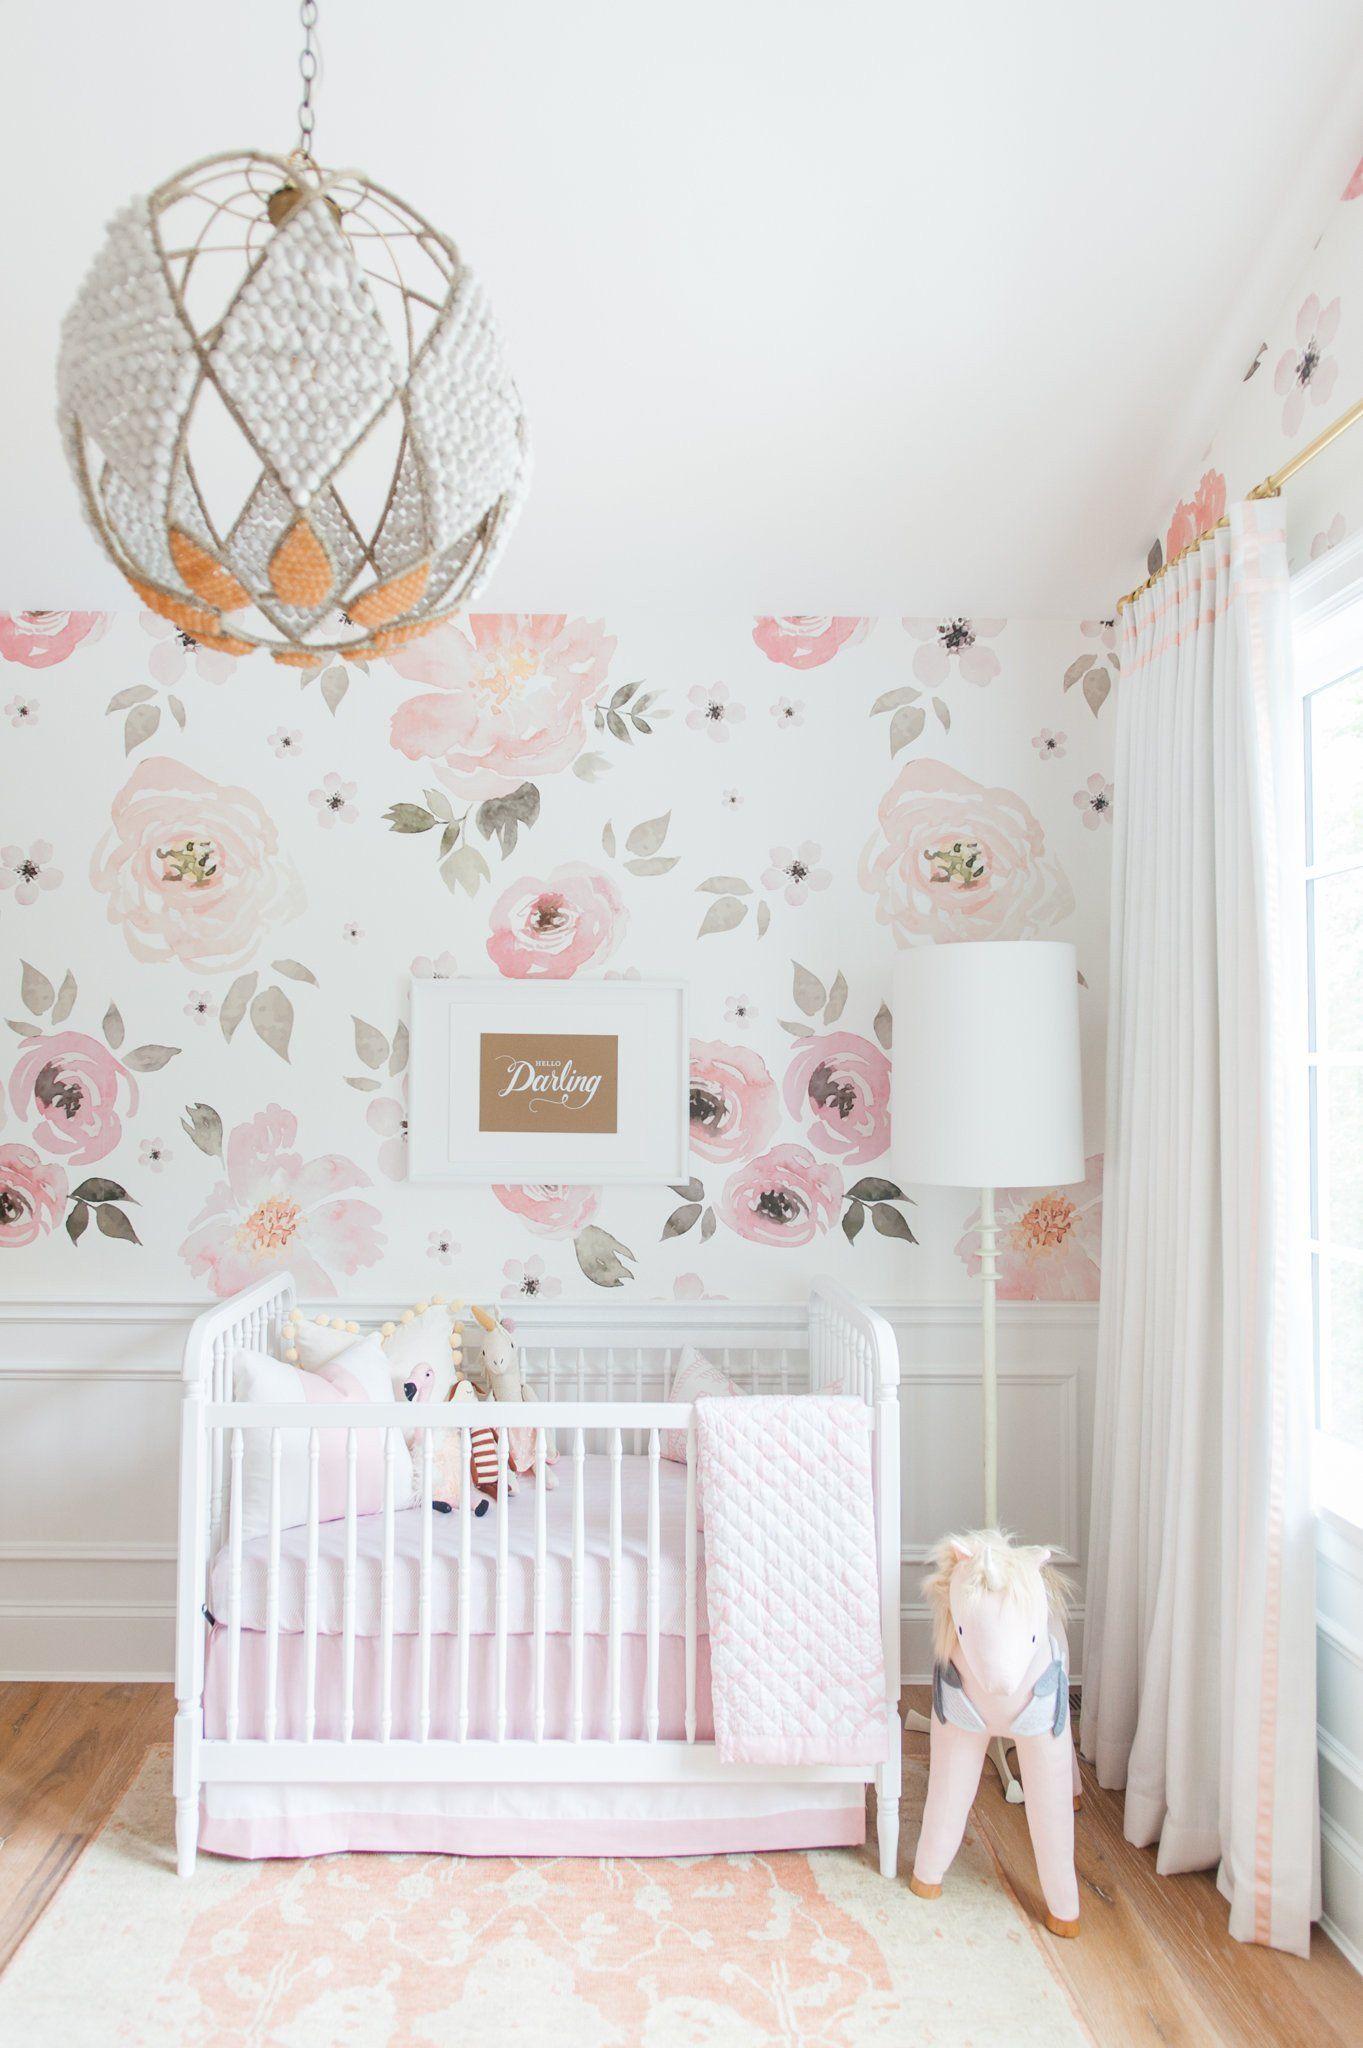 Jolie Wallpaper Mural Girl room, Girls bedroom, Nursery